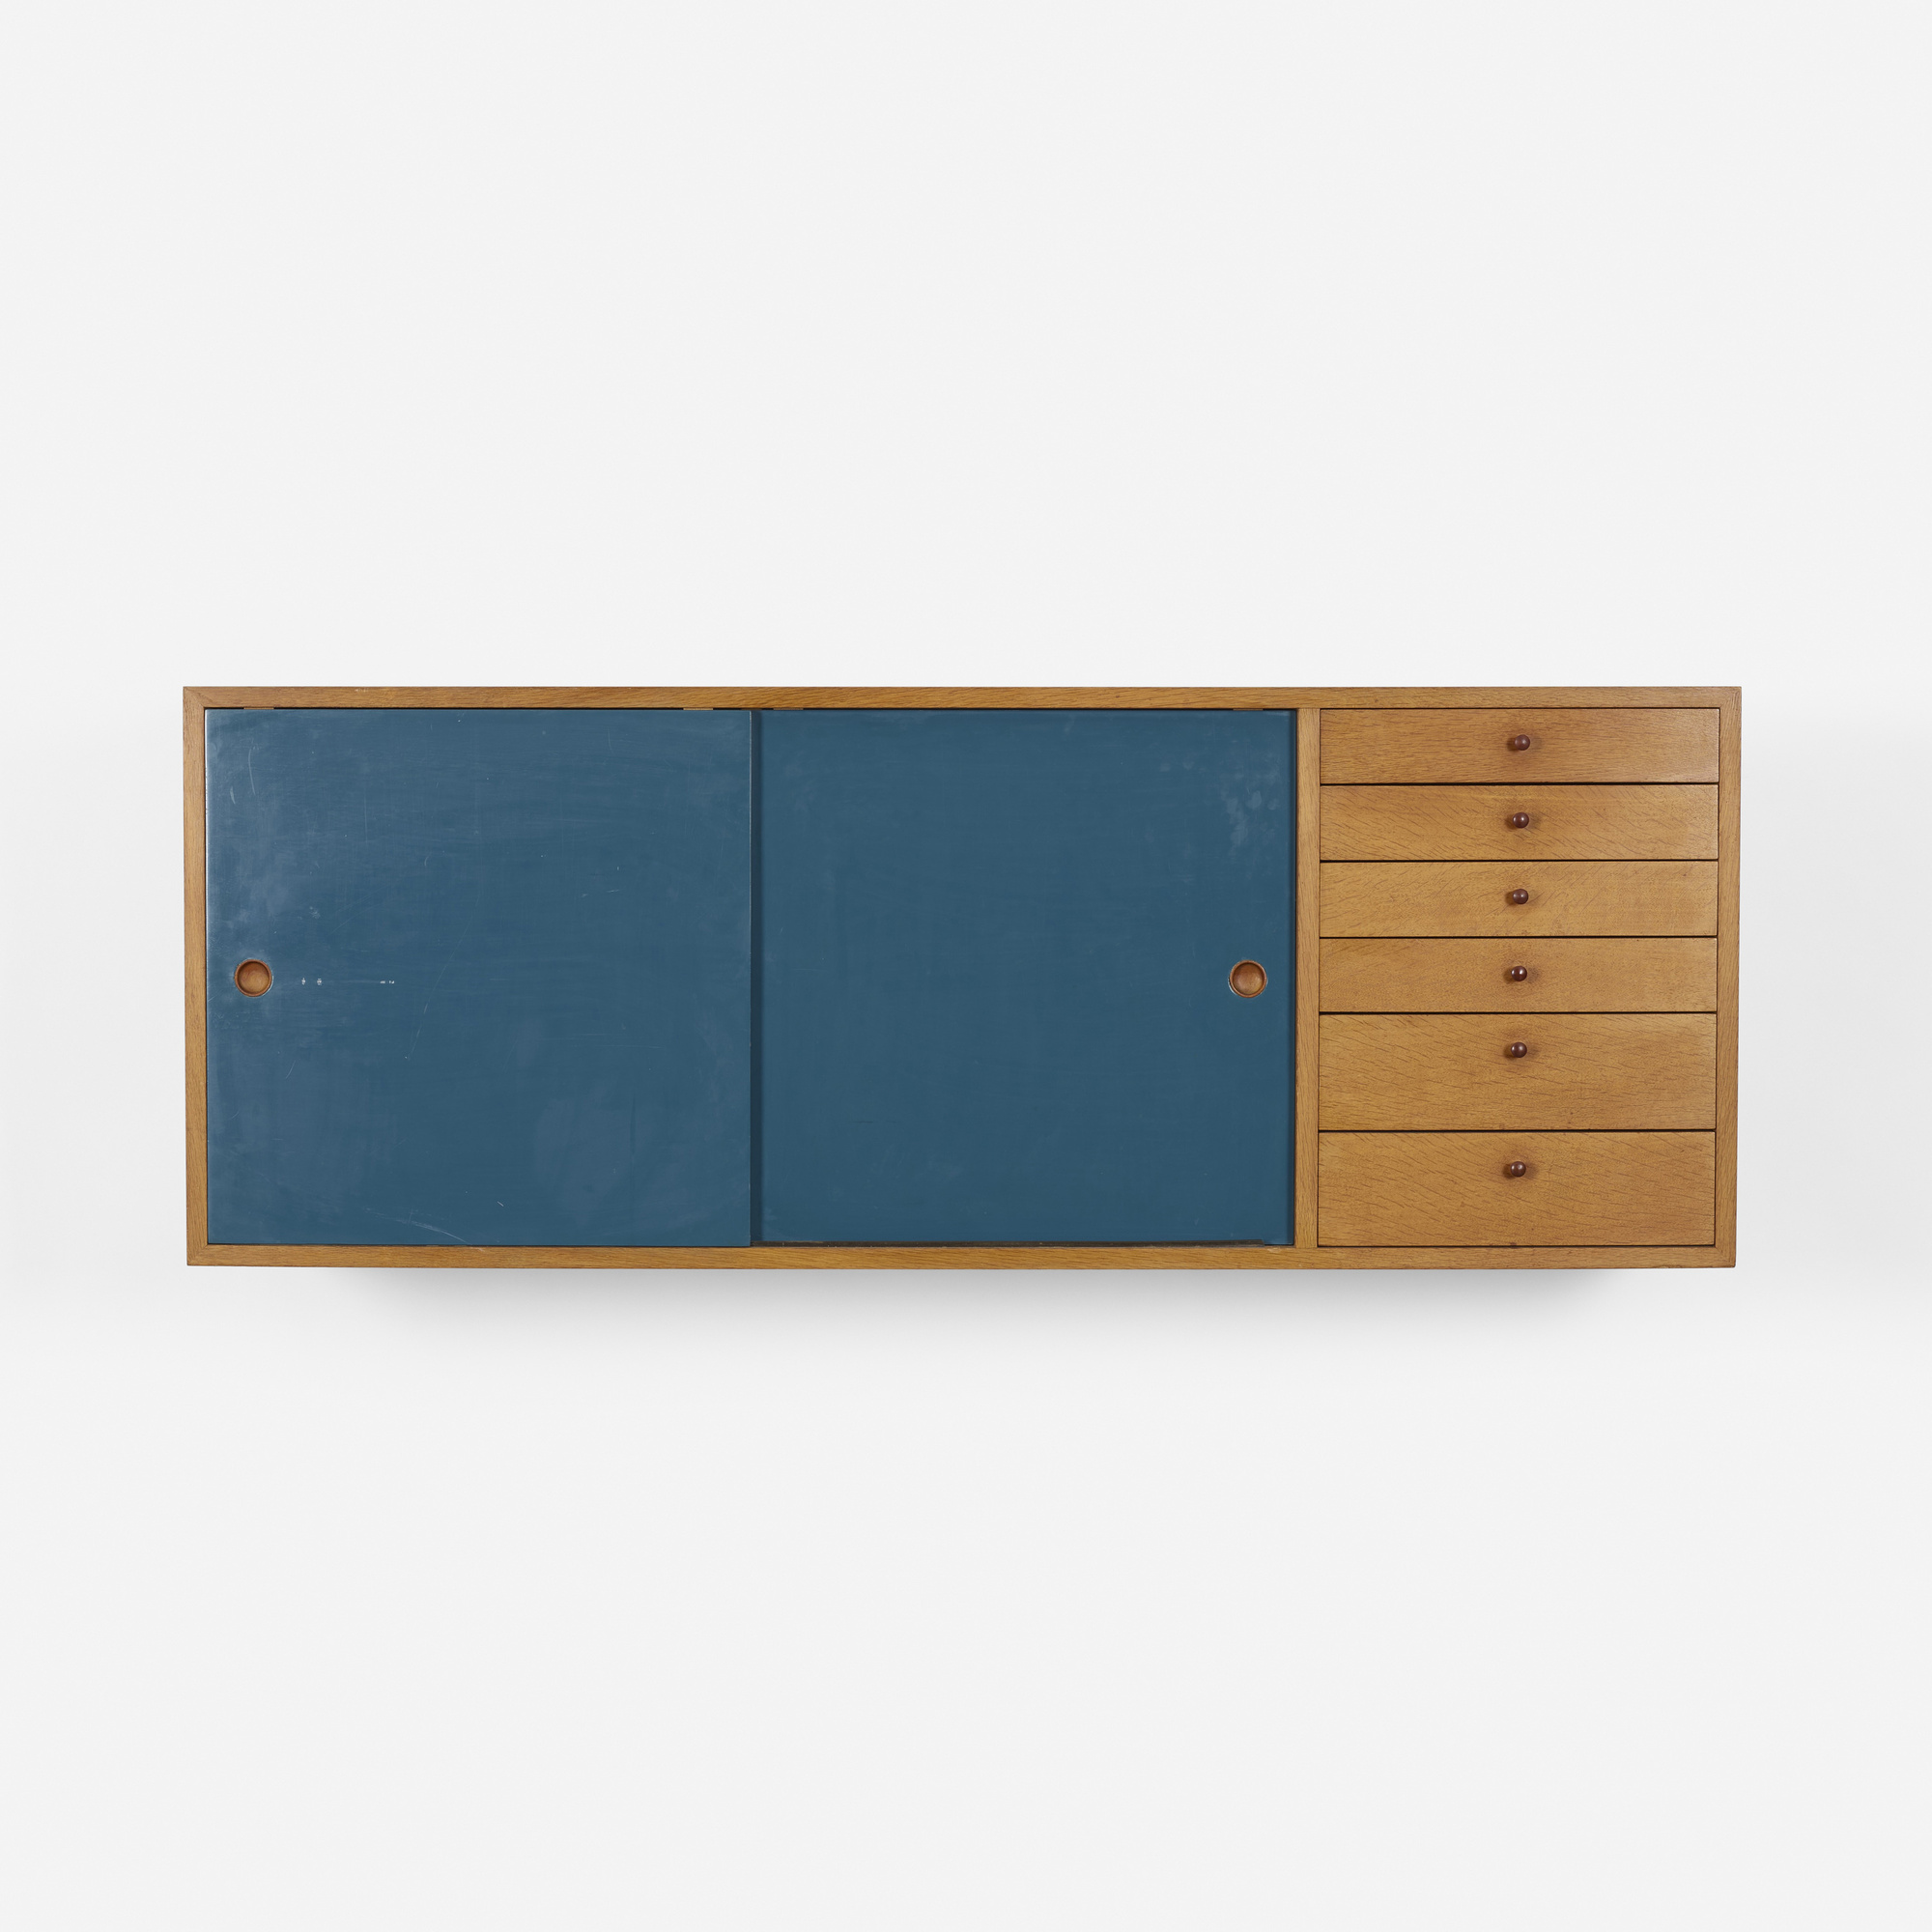 263: Arne Vodder / wall-mounted cabinet (2 of 3)